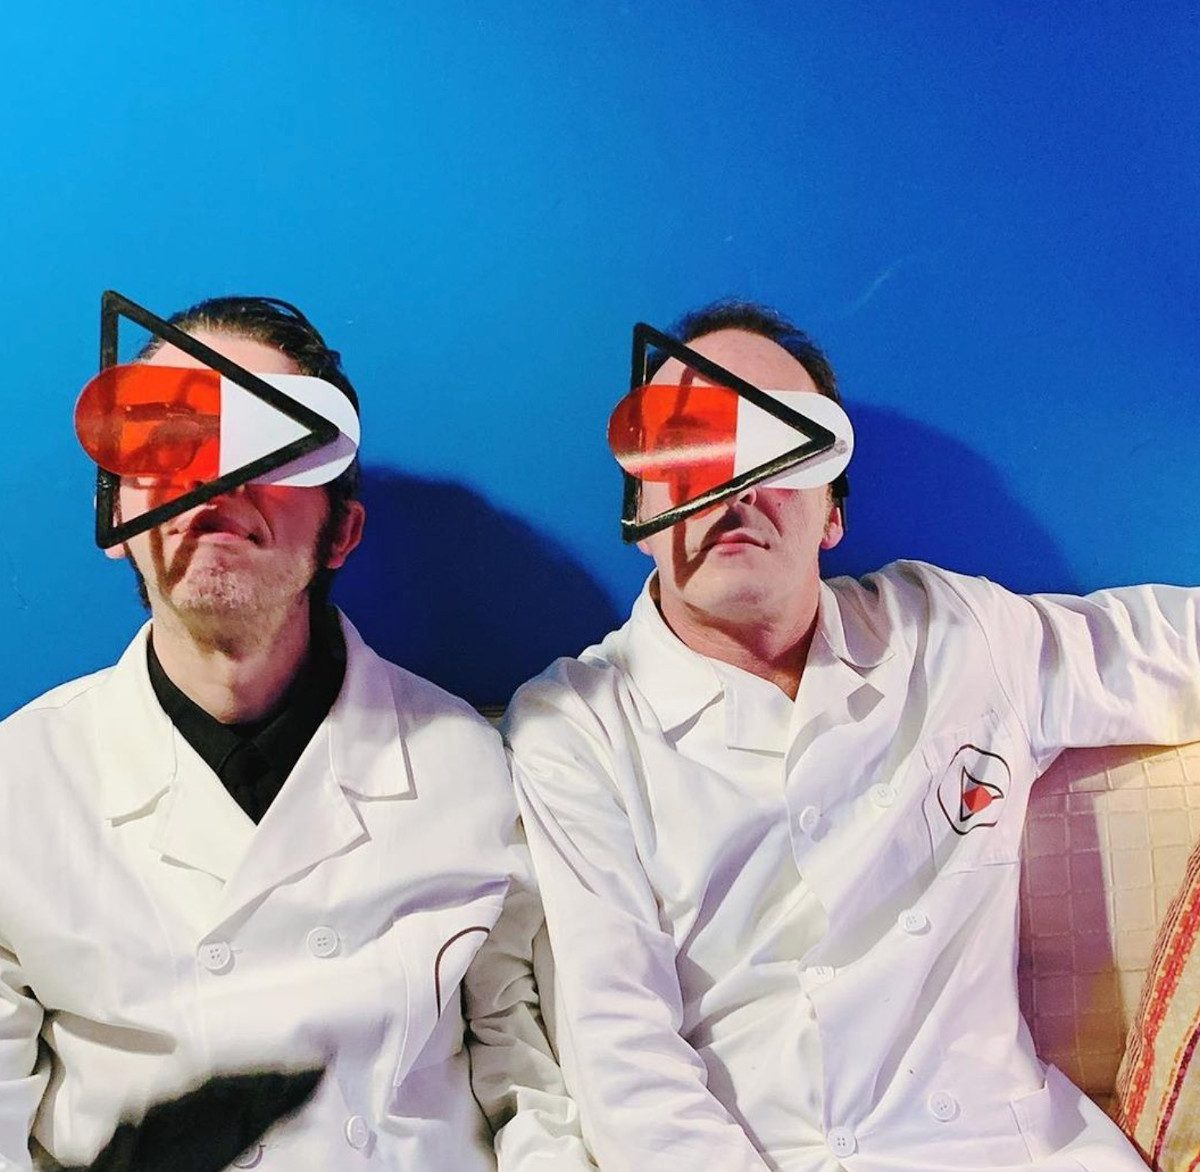 Italian futurepop/ebm band Anticorpi release new single / video 'Nuovo Ordine Mondiale/New World Order' from upcoming album 'Vote For Extinction'